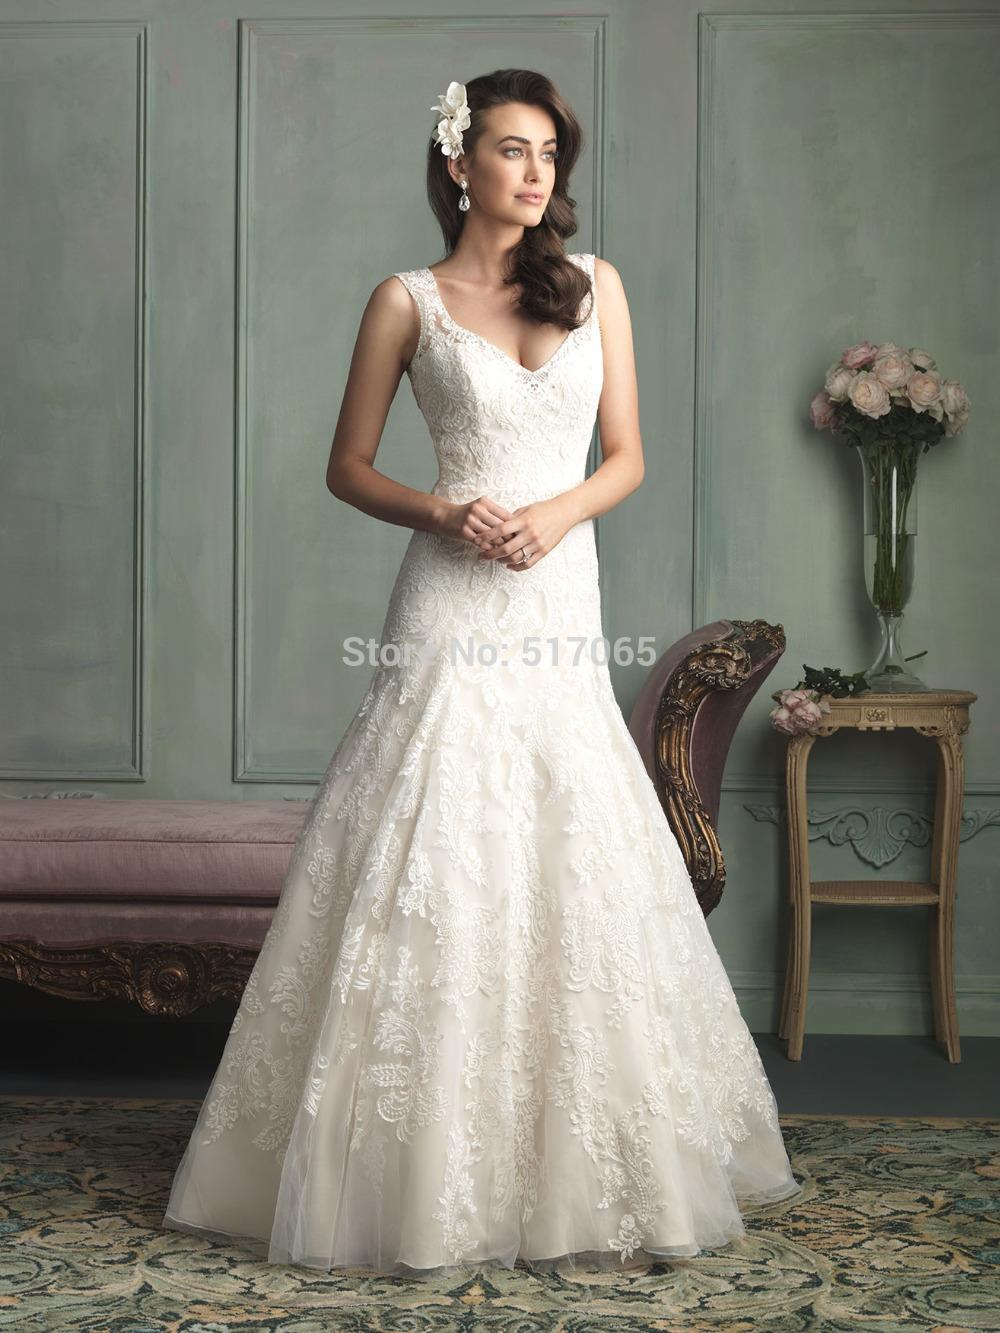 Fashionable Vestidos De Noiva New Cap Sleeve Listing On The 2014 Air Quality Mermaid Wedding Dress Lace Sleeveless Hot Selling(China (Mainland))